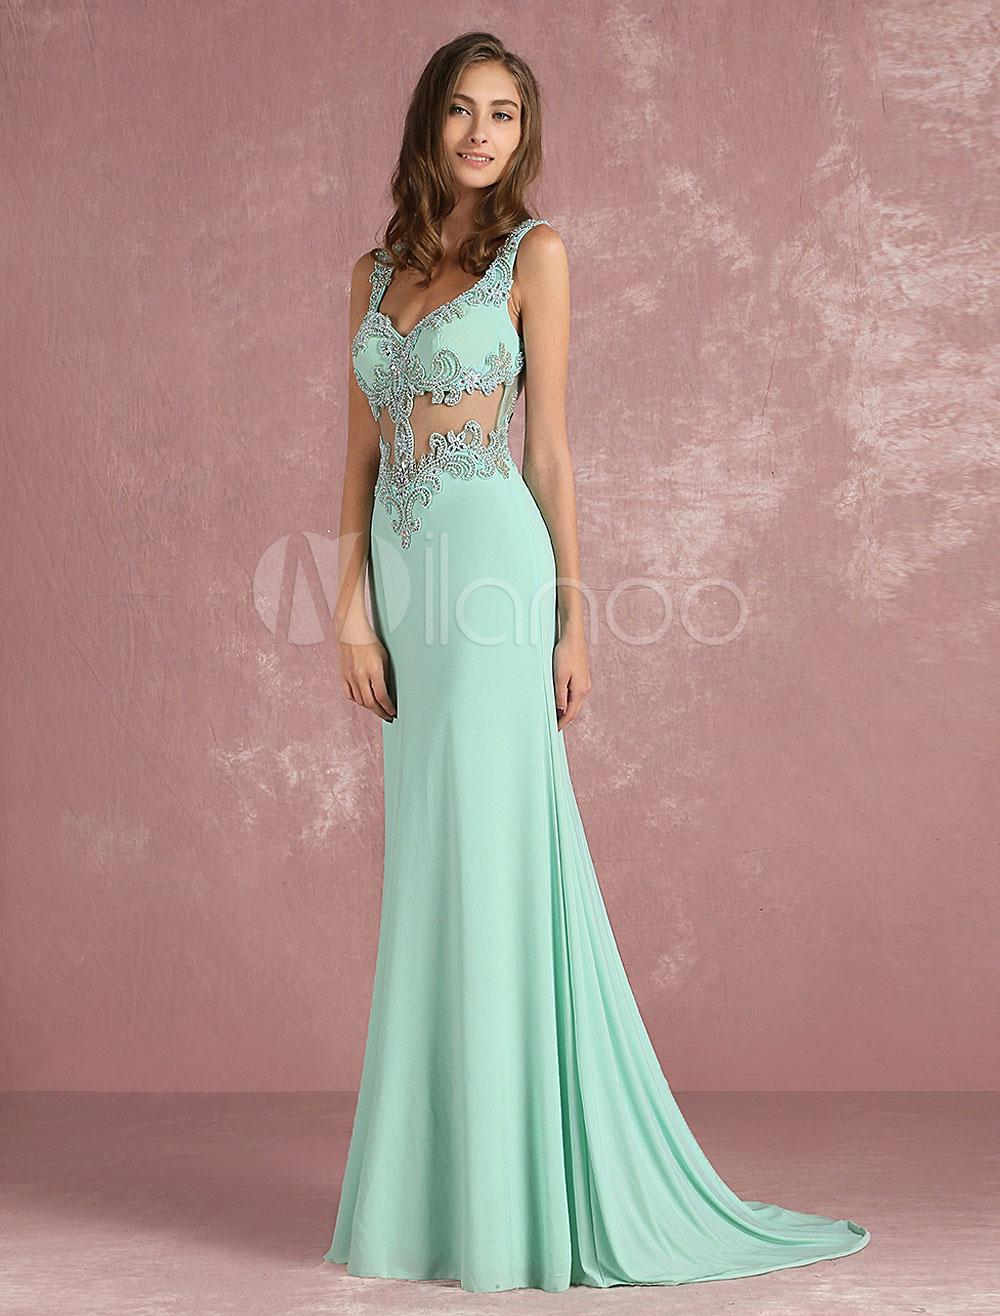 Mermaid Evening Dress Mint Green Illusion Beading Prom Dress Sweetheart Sleeveless Floor Length Party Dress With Train (Wedding Evening Dresses) photo